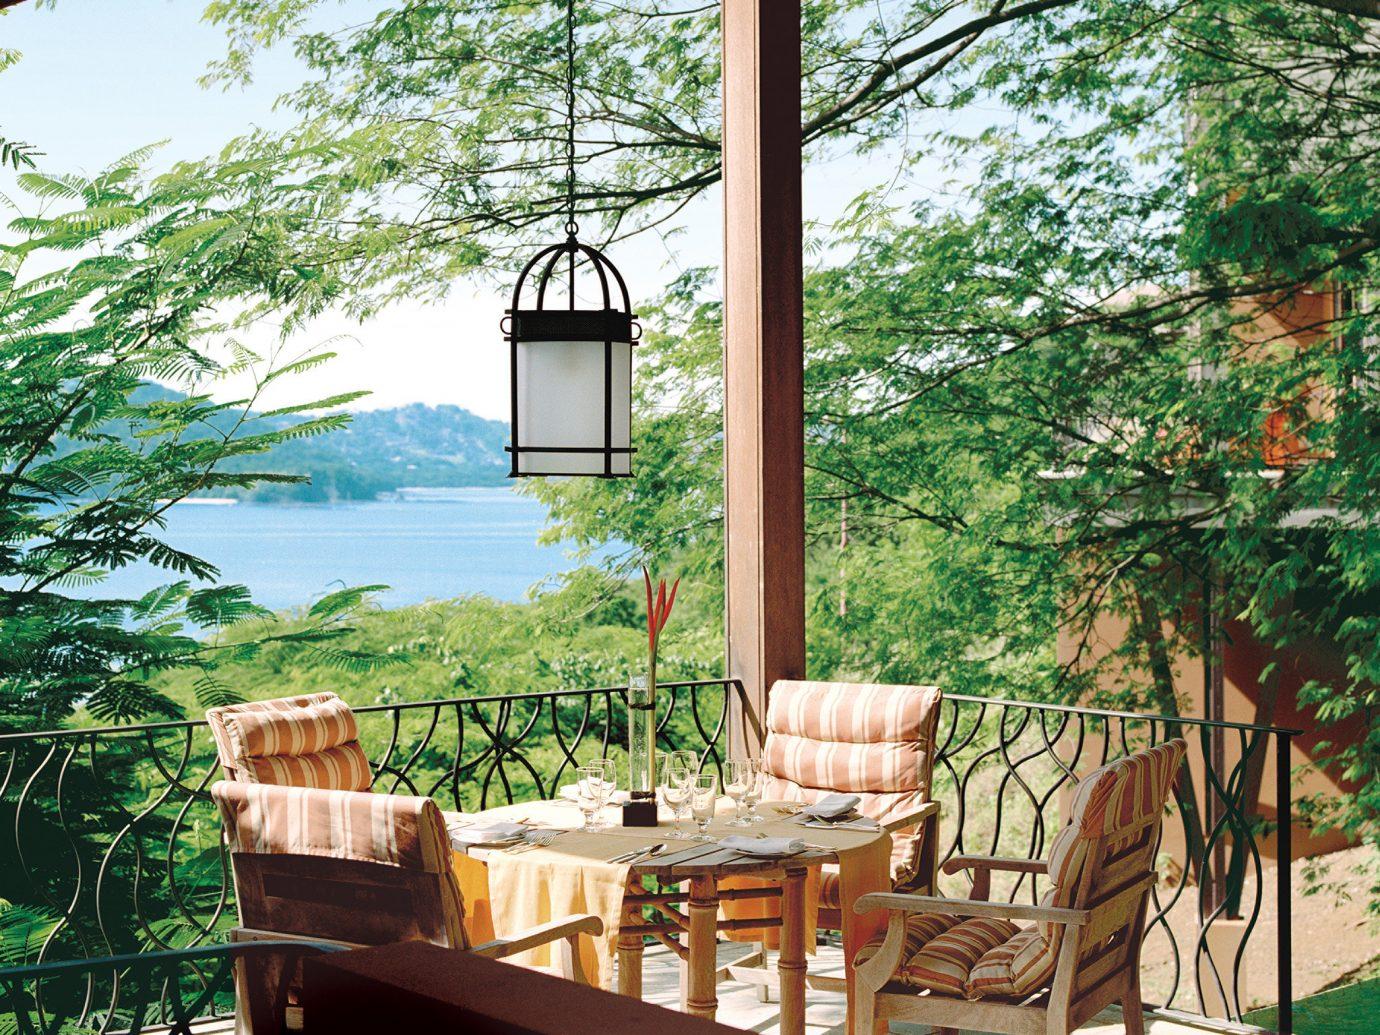 The Four Seasons Luxury Resort In Costa Rica